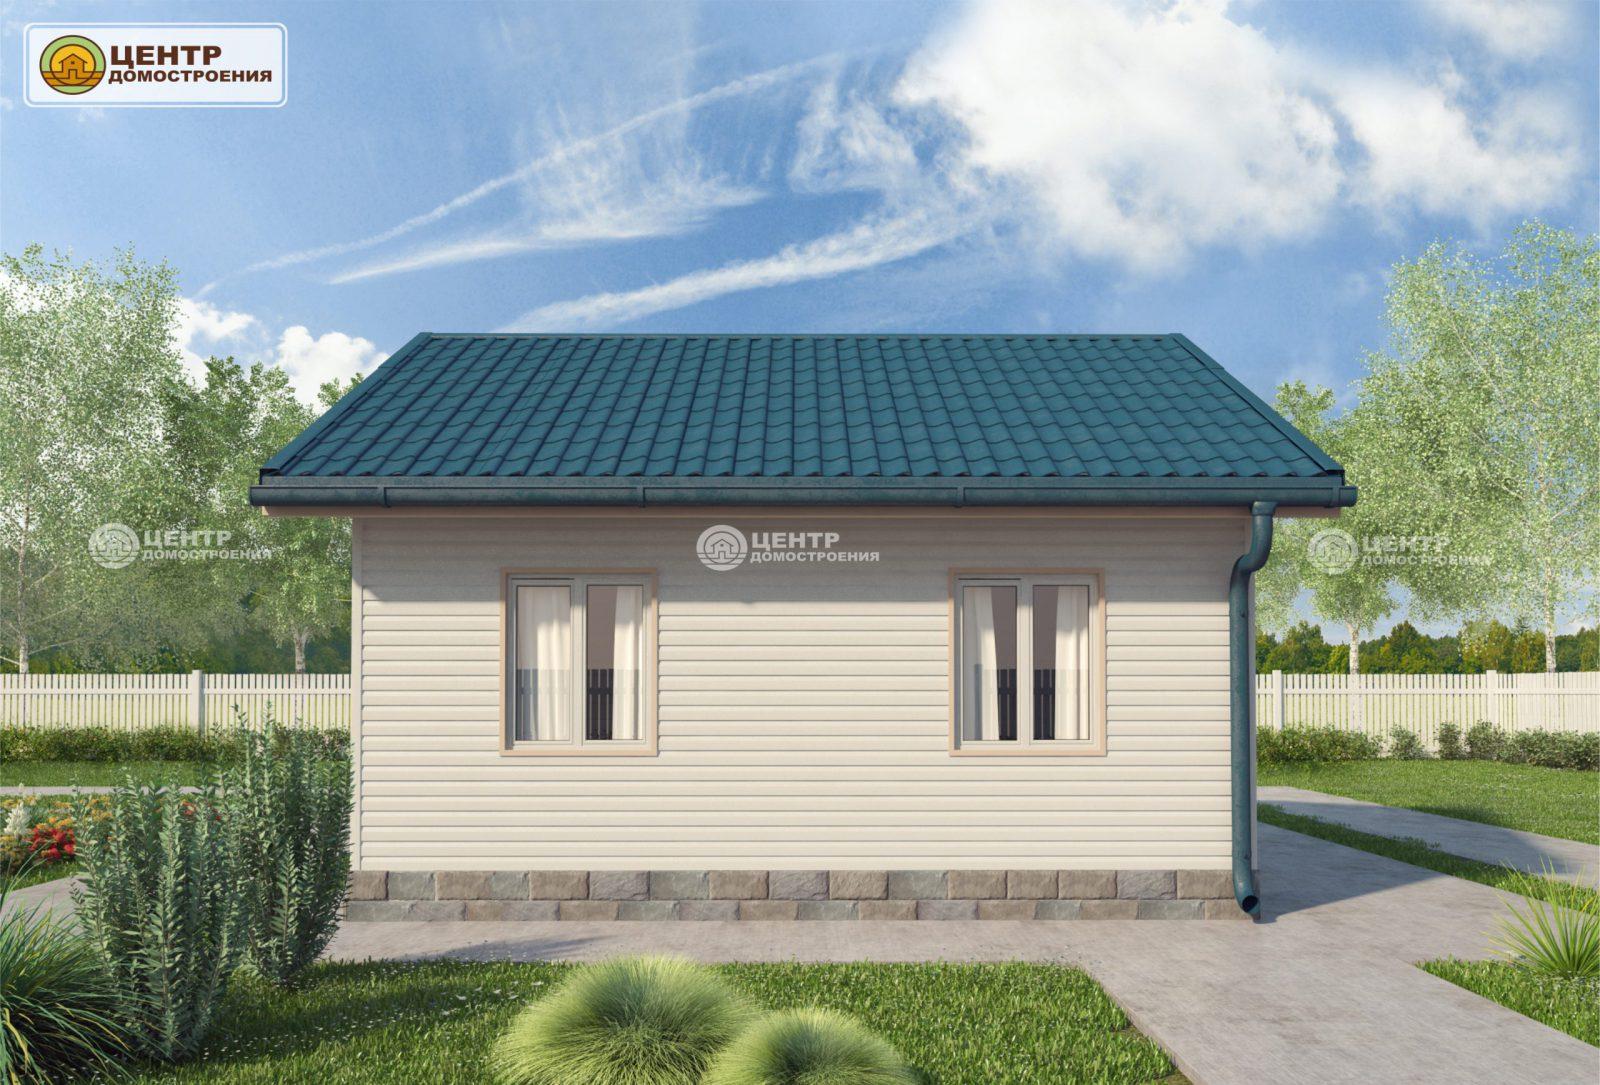 Проект одноэтажного дома 6 на 6